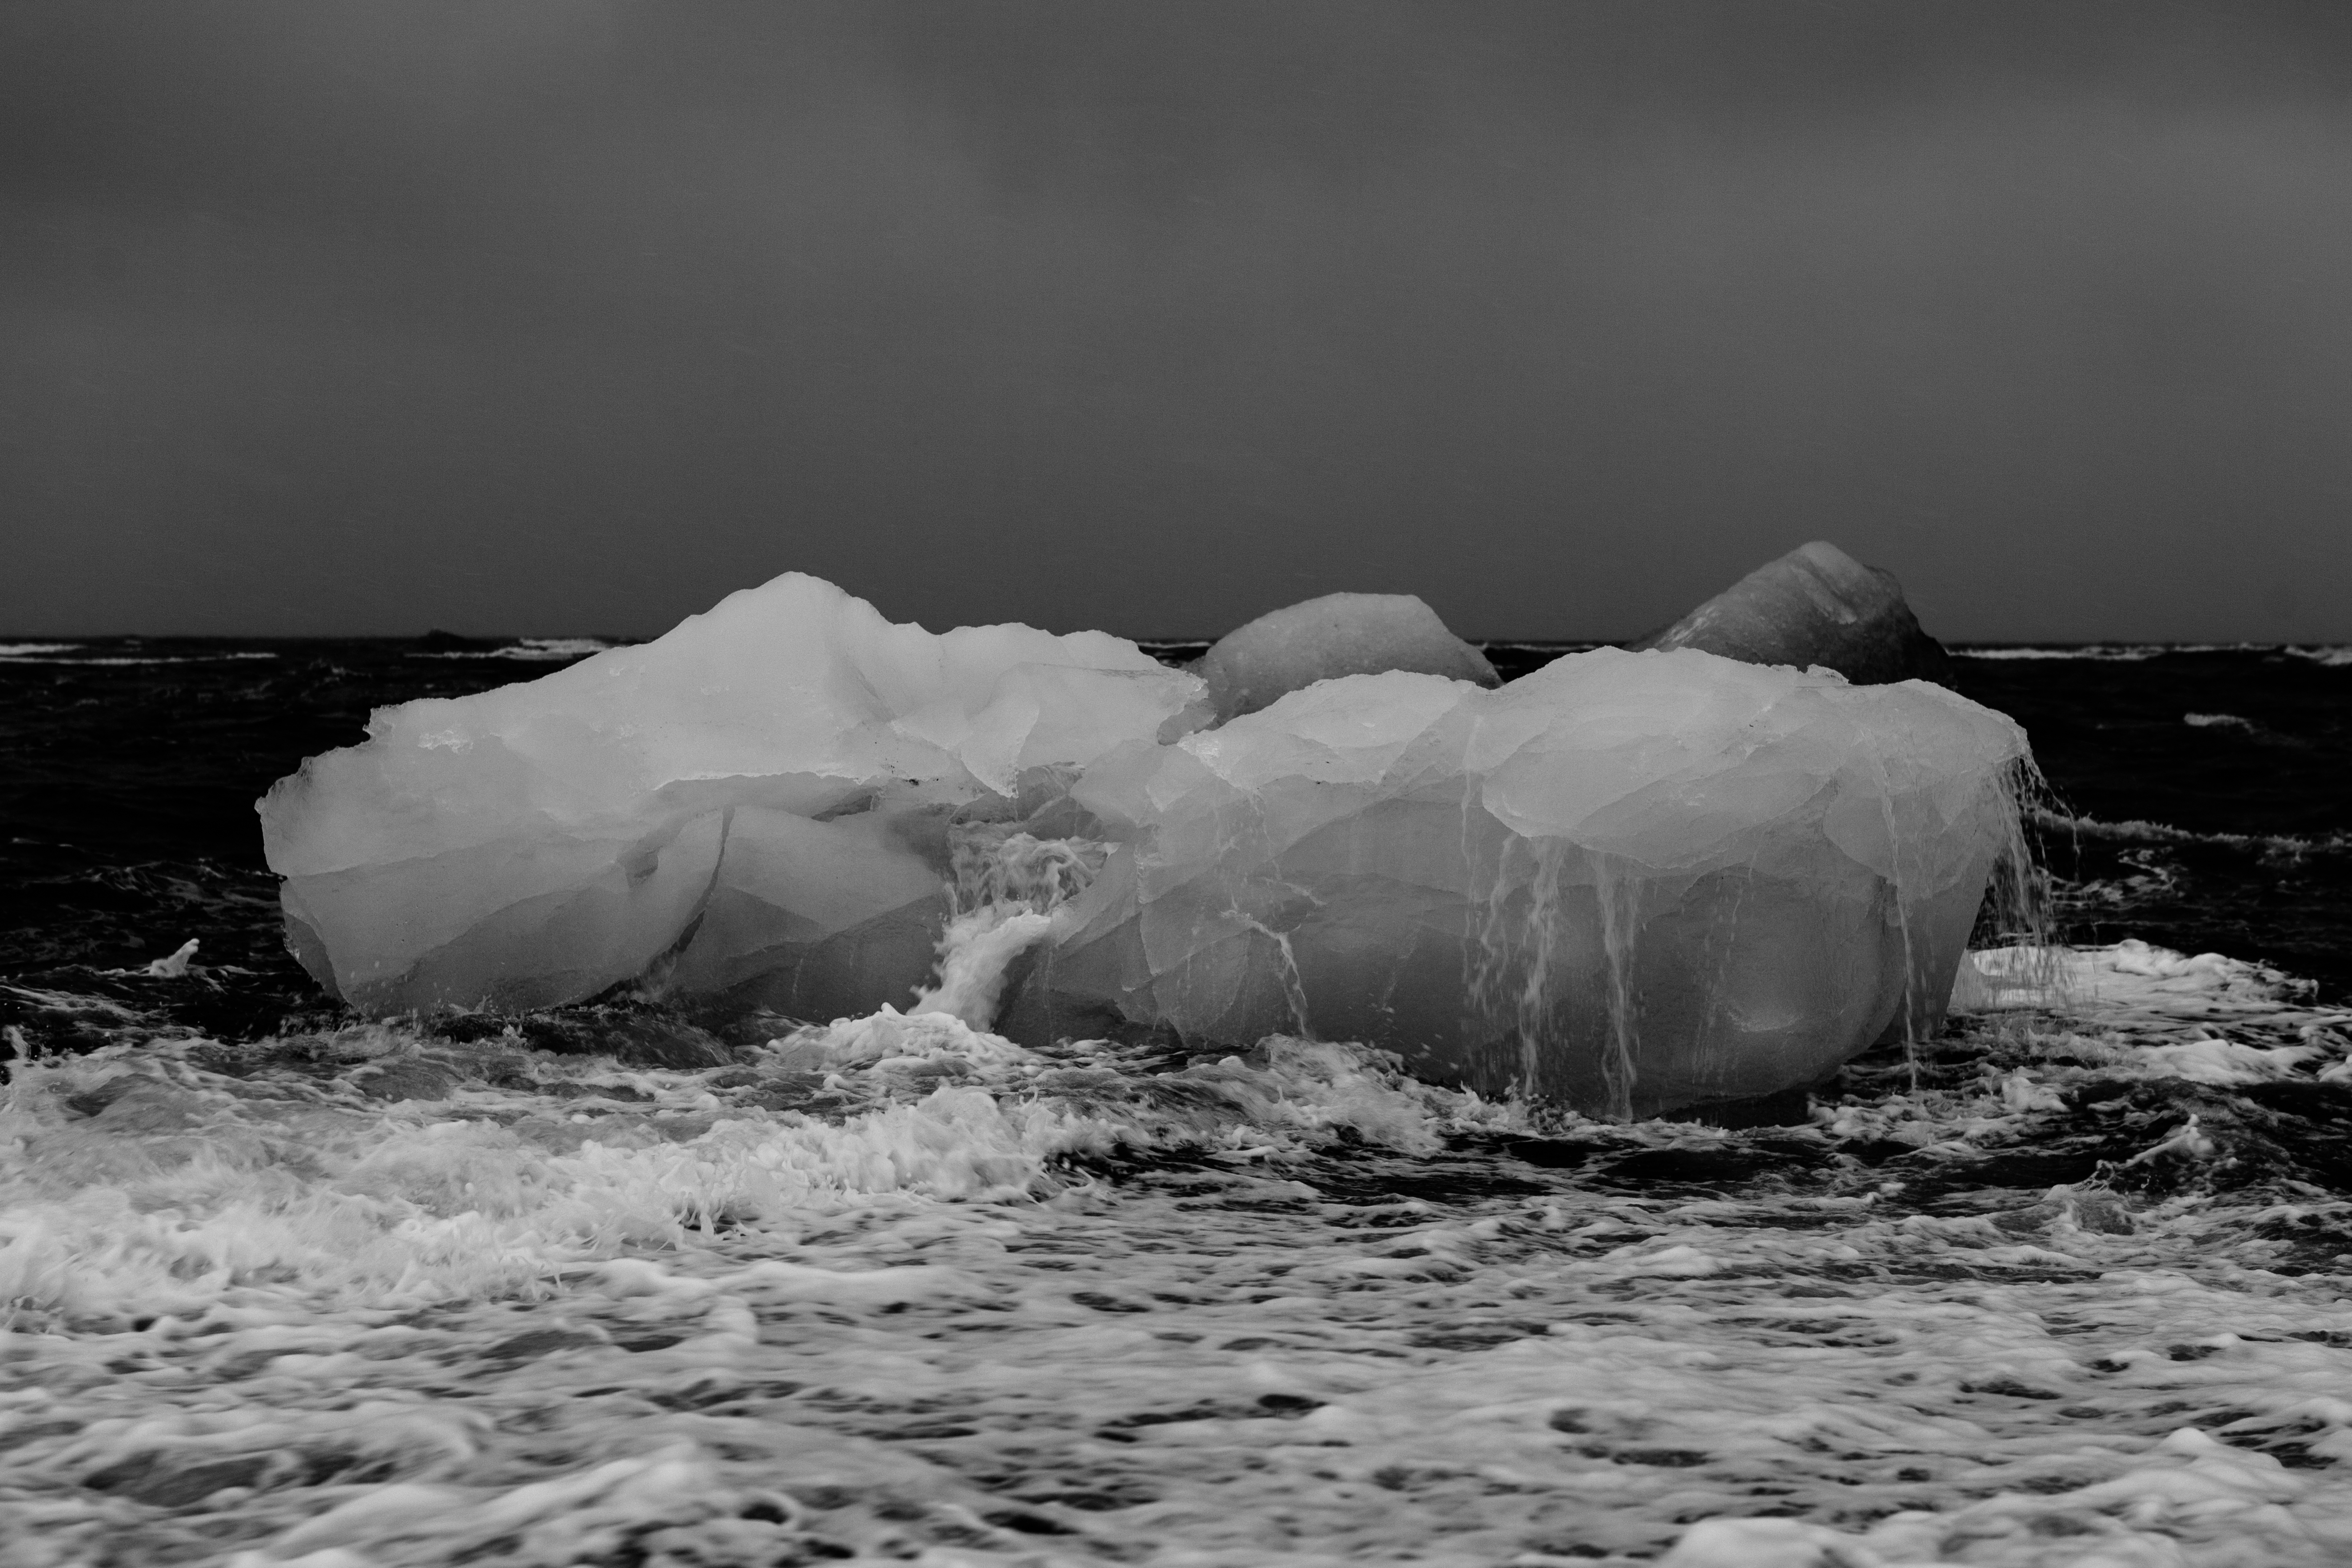 Iceberg blanco y negro